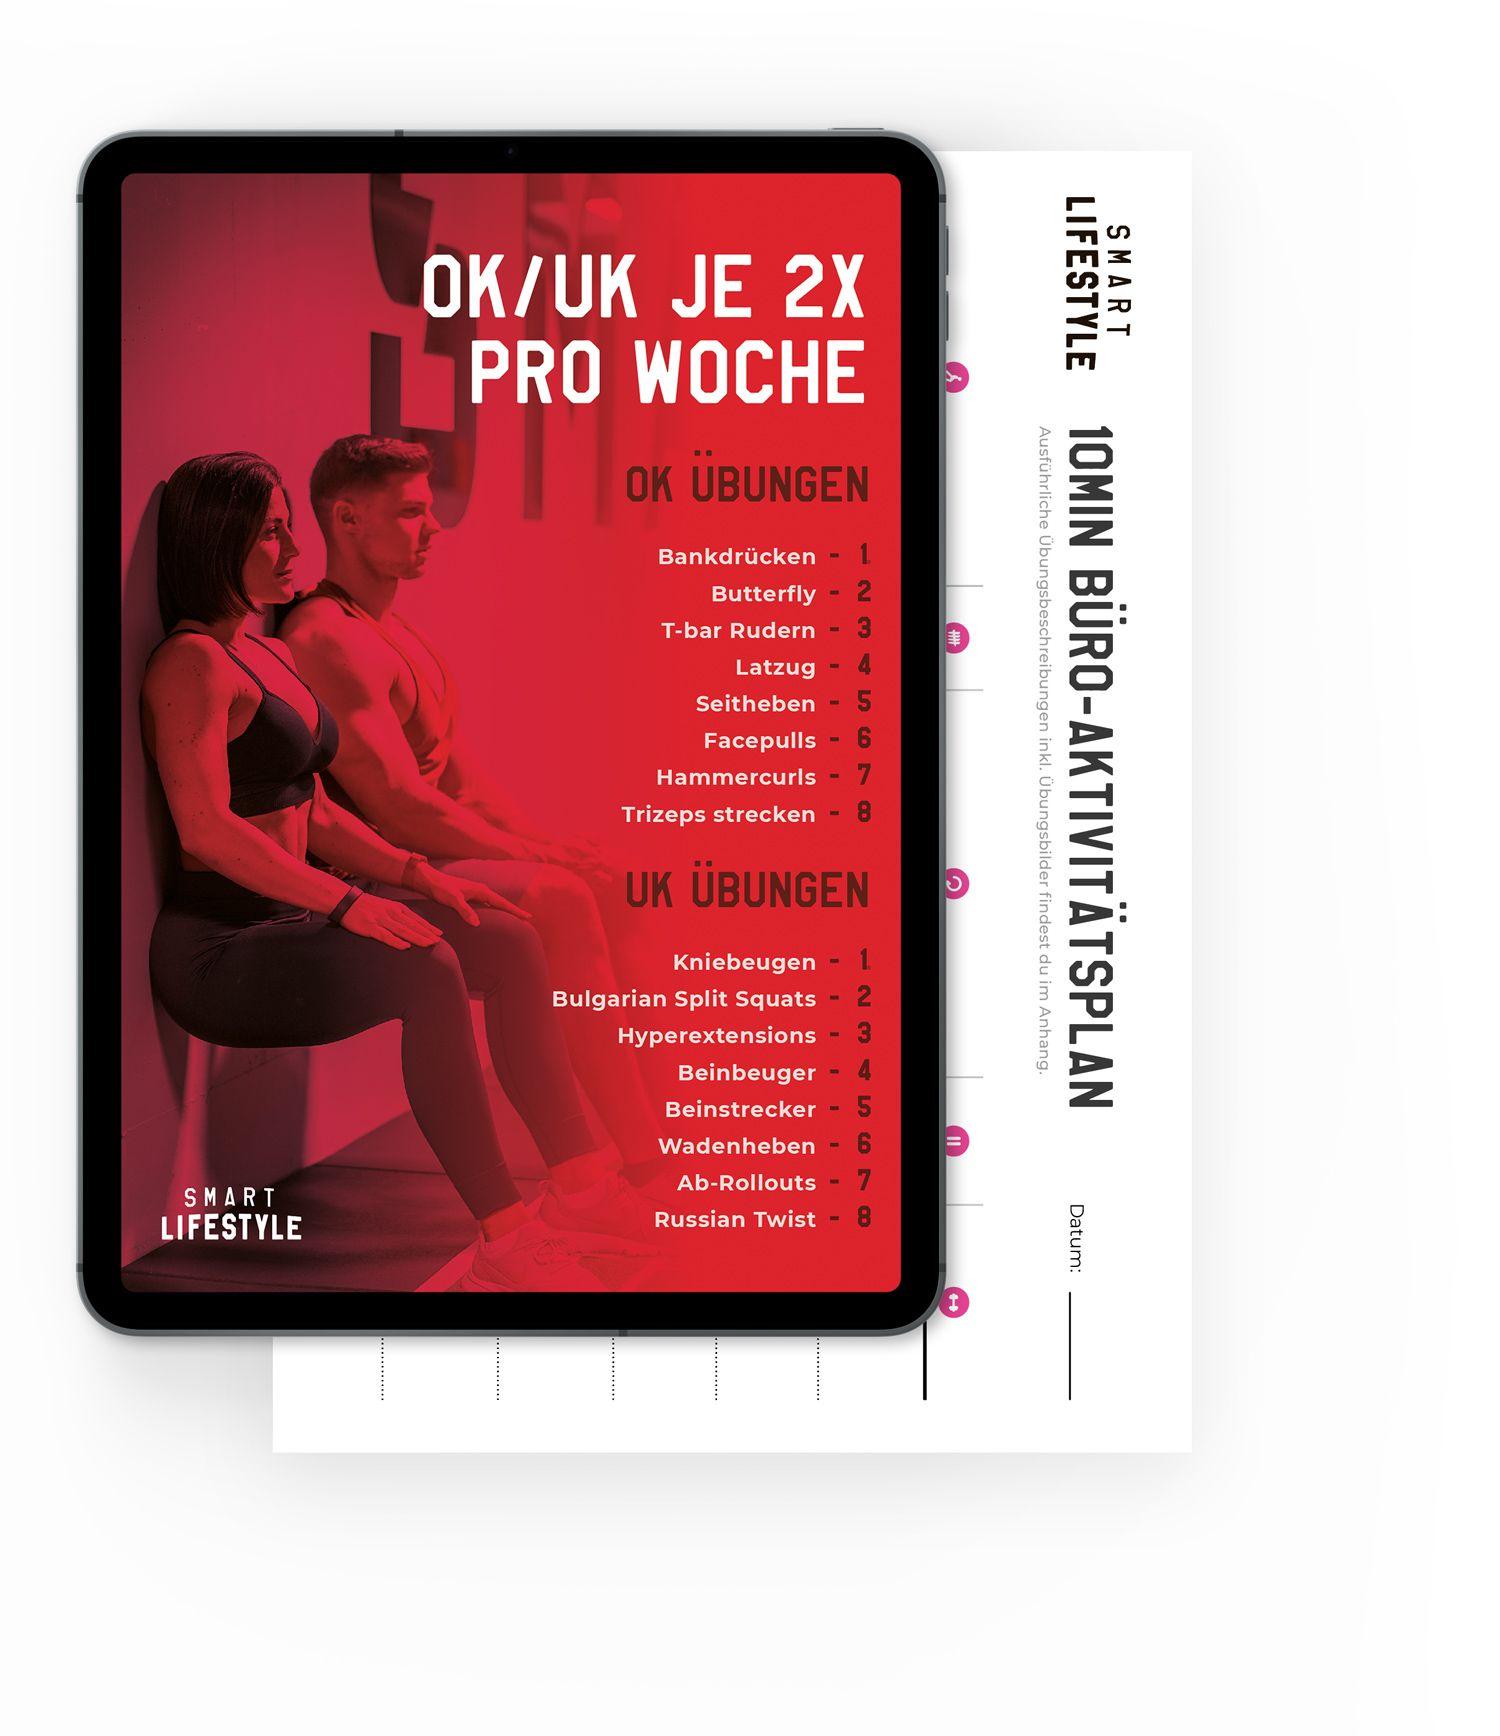 female-trainingsplan-smartlifestyle-preview